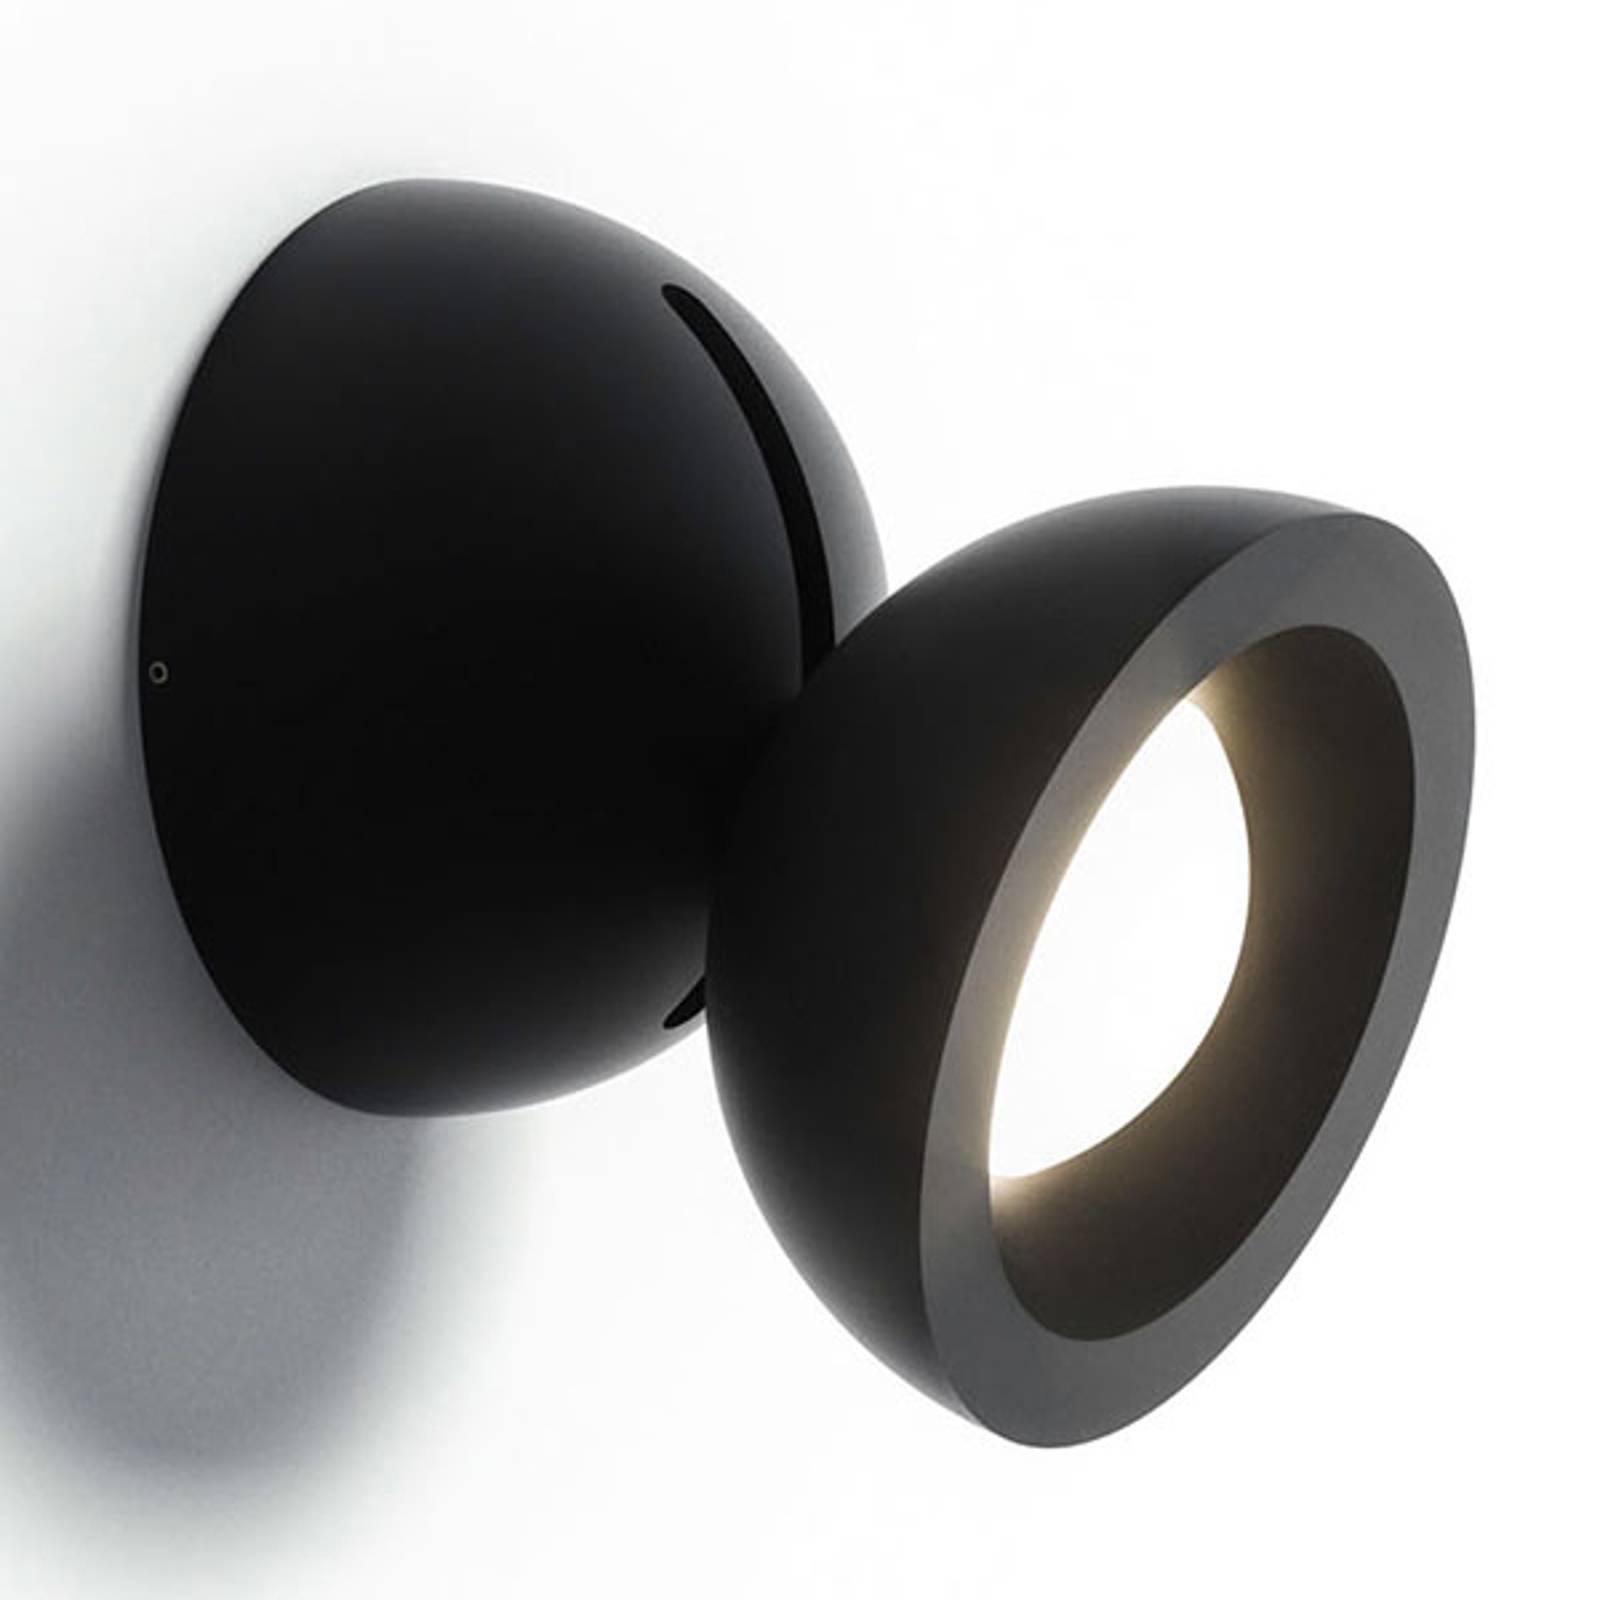 Axolight DoDot LED wandlamp, zwart 46°